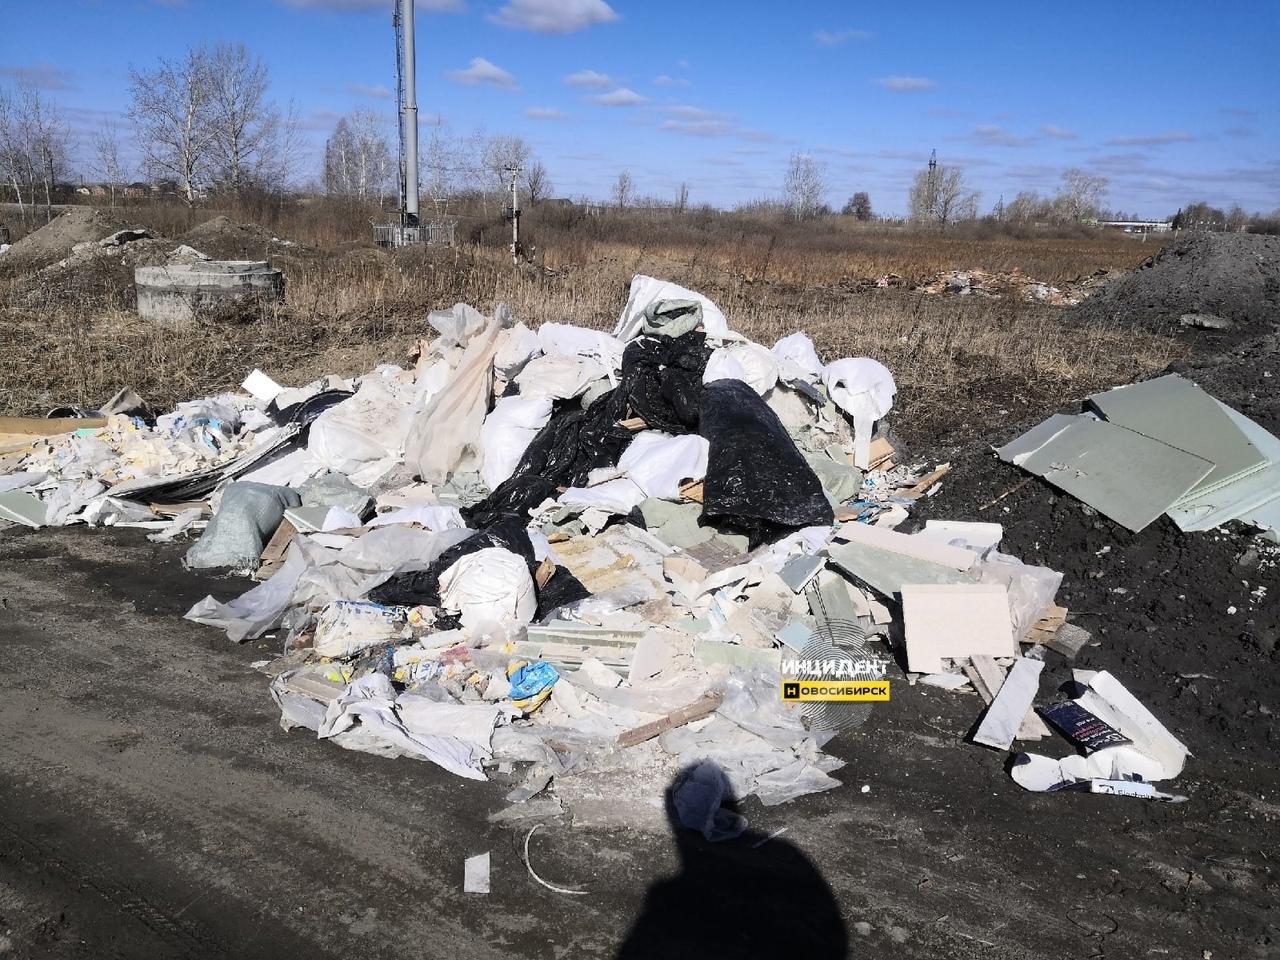 фото Горы мусора на берегу озера возмутили жителей Новосибирска 3